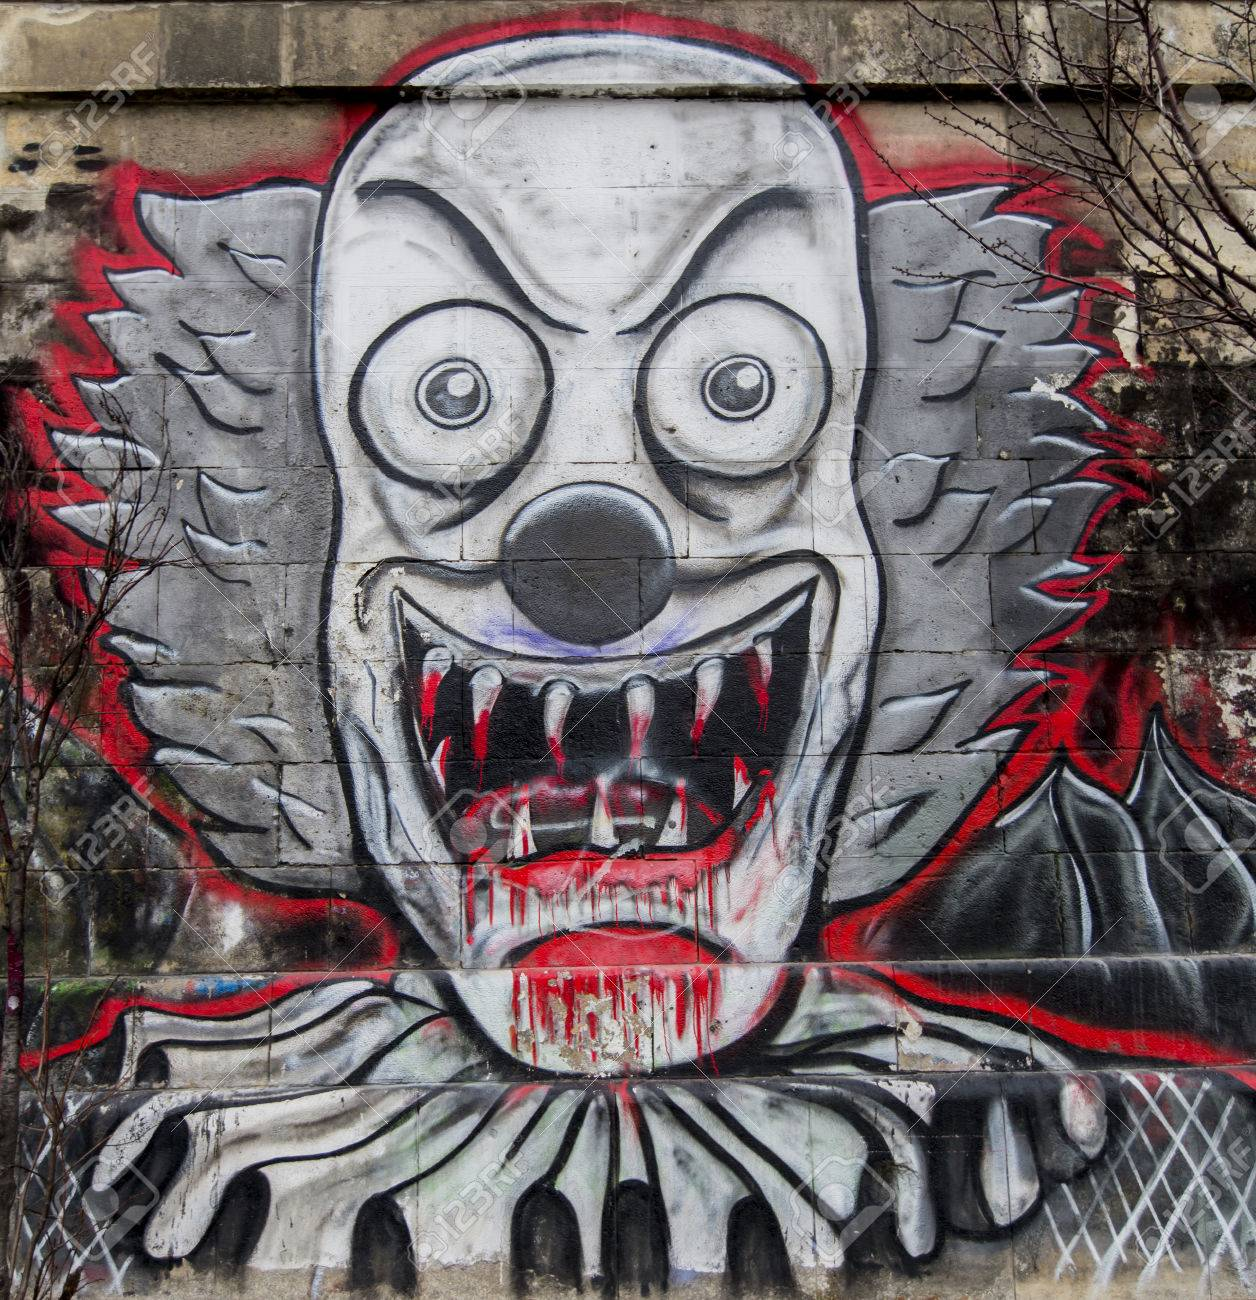 Space Branding Graffiti Street Art Calligraphy Installation